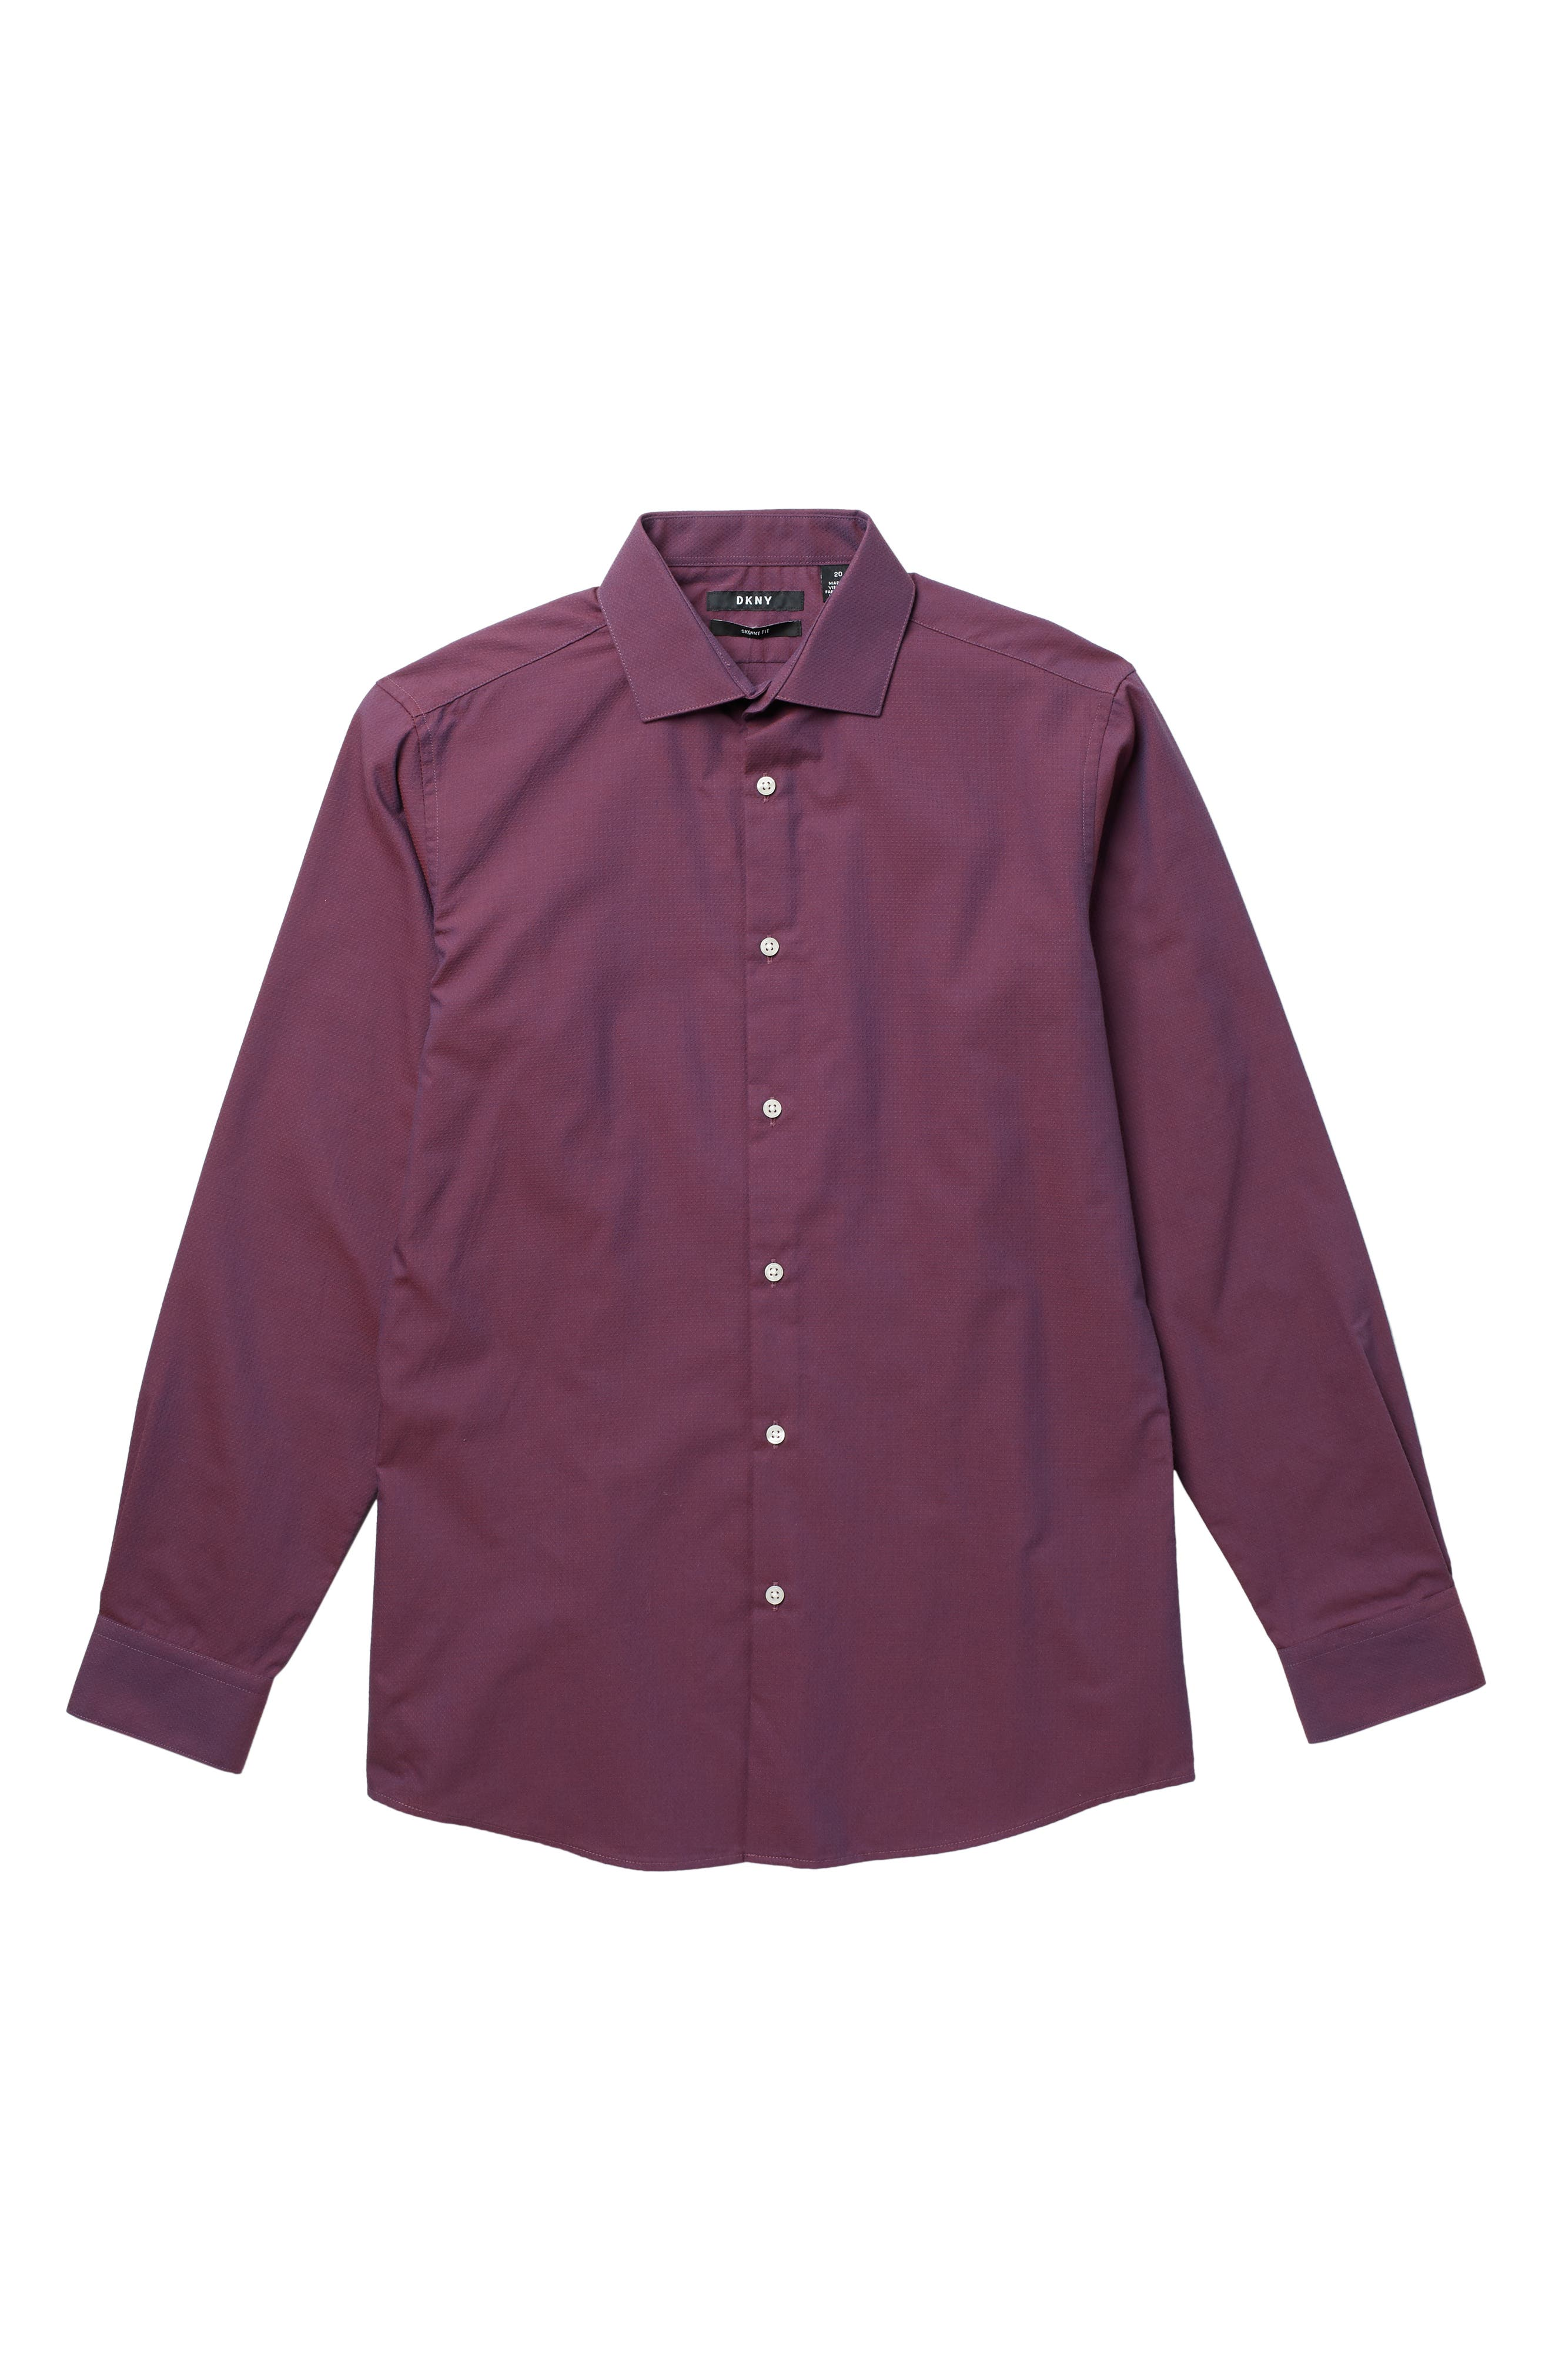 Image of DKNY Neat Cotton Woven Shirt